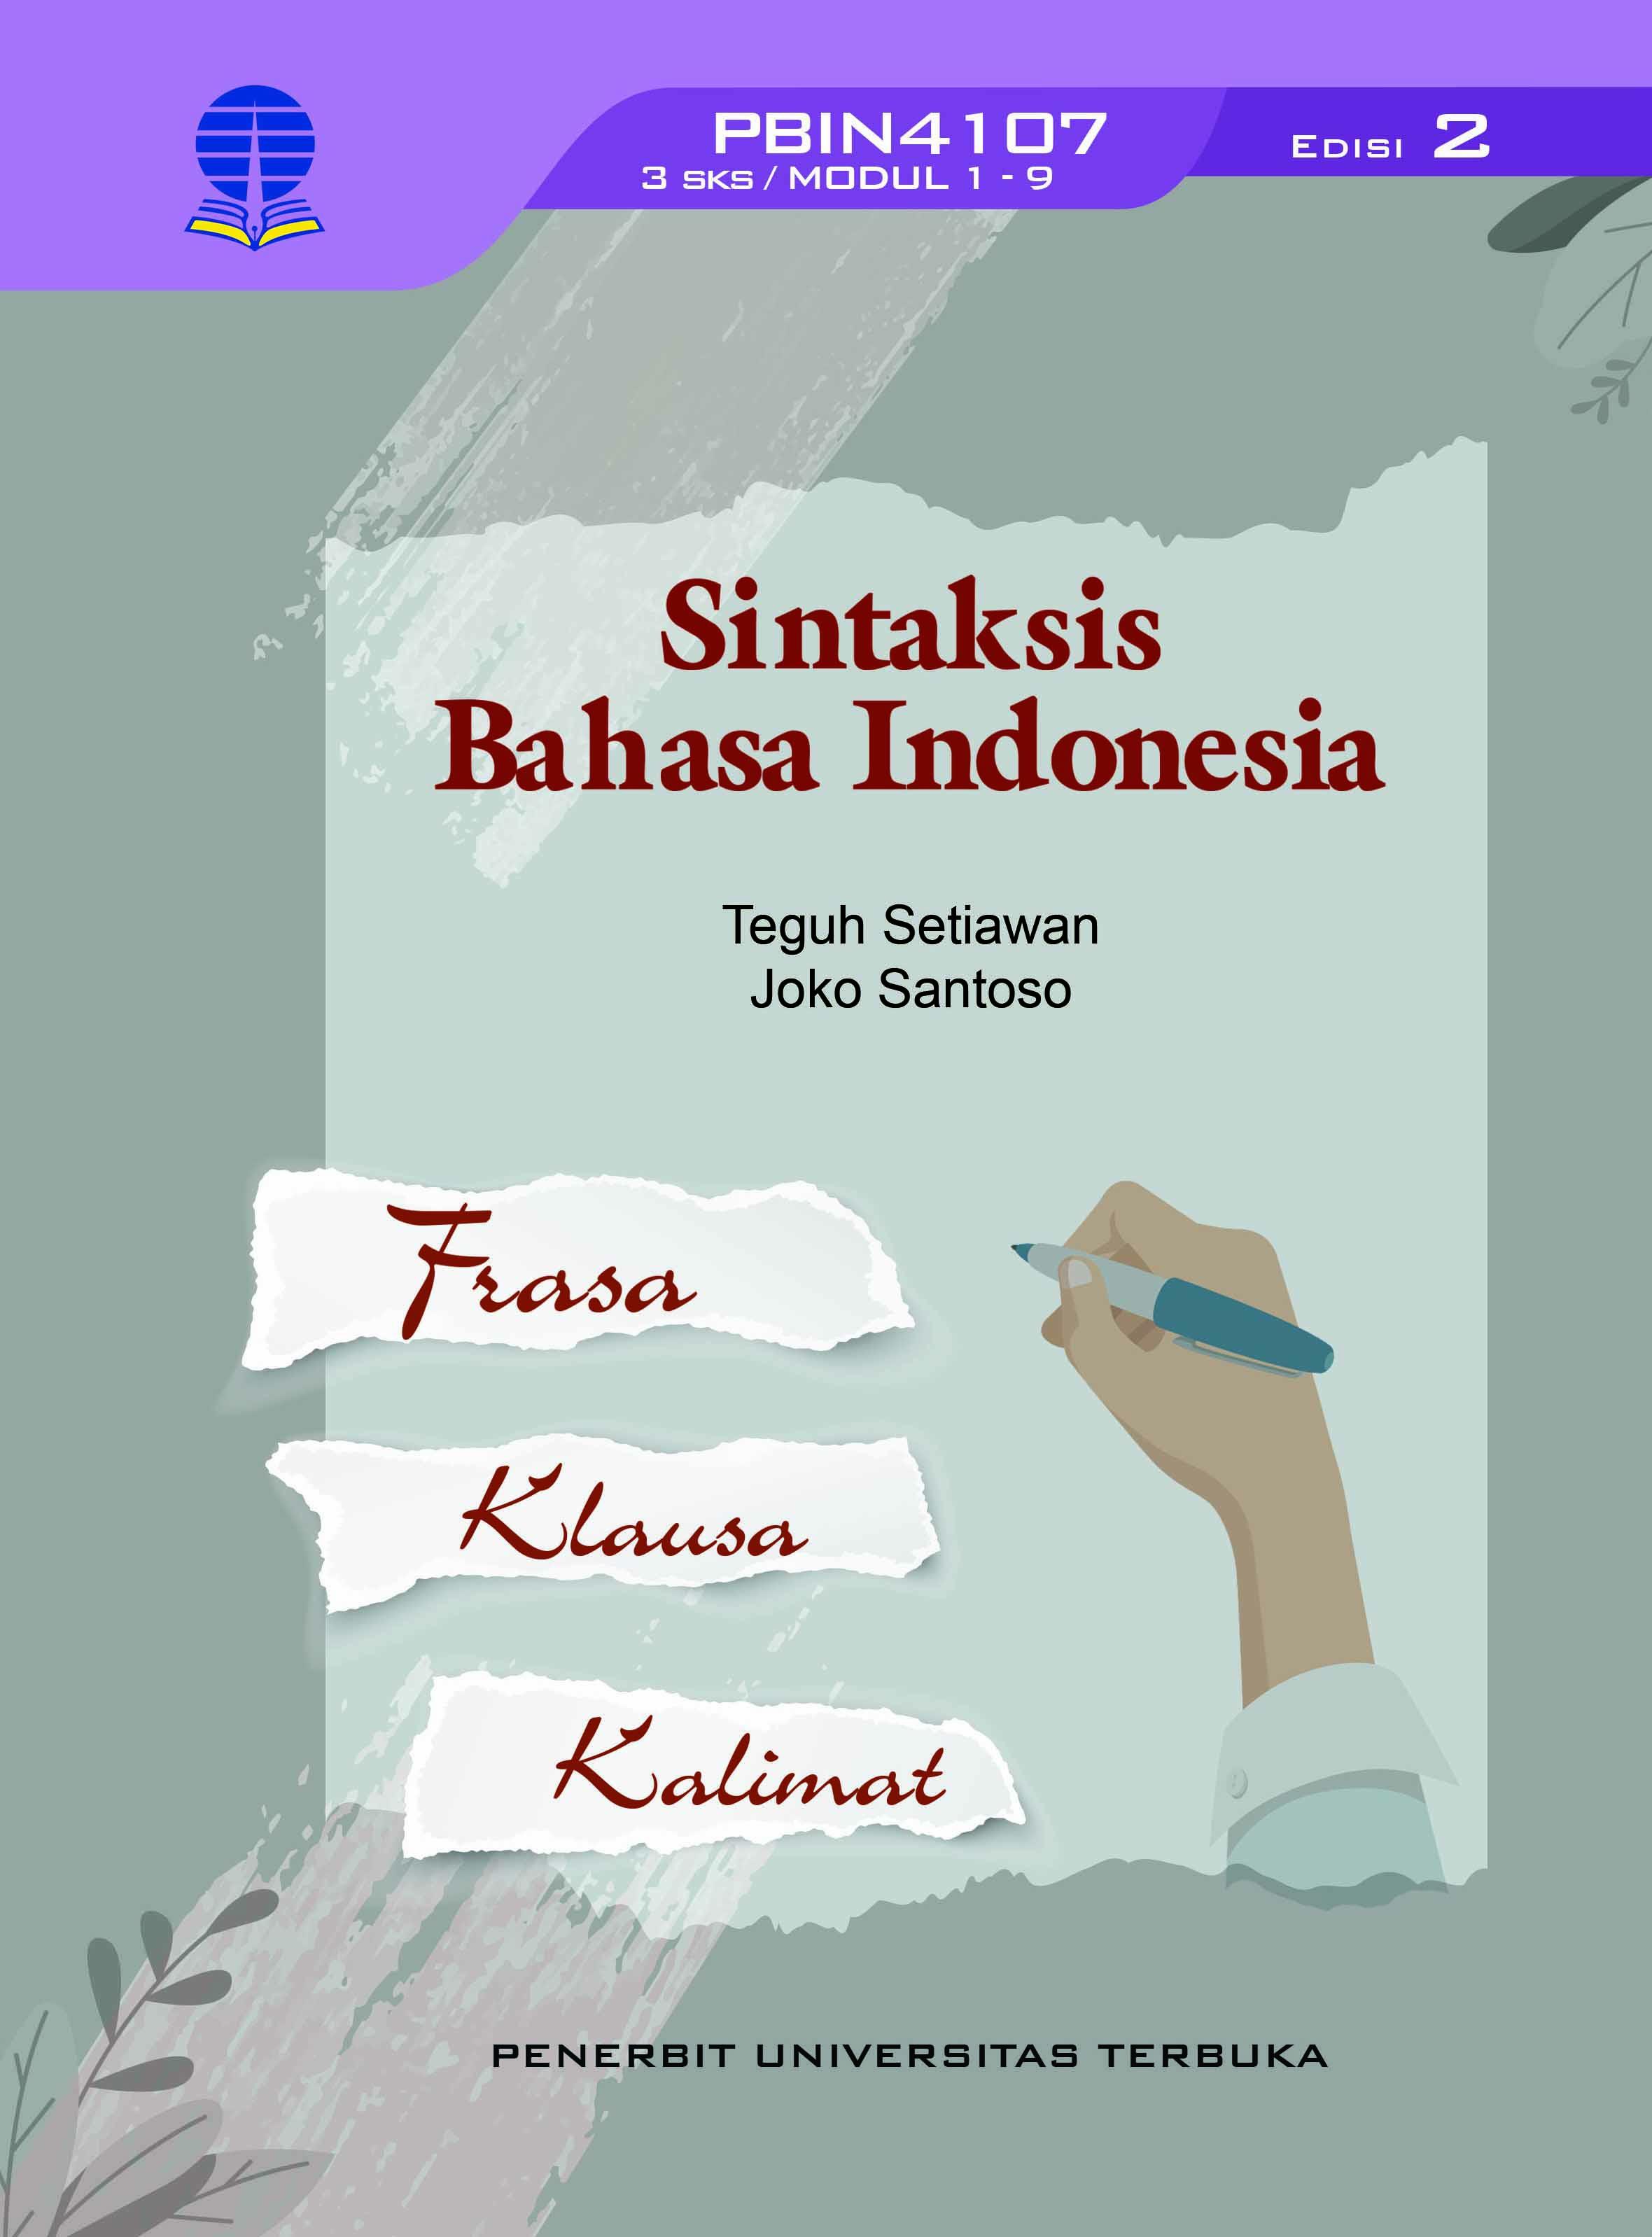 Sintaksis bahasa Indonesia [sumber elektronis]